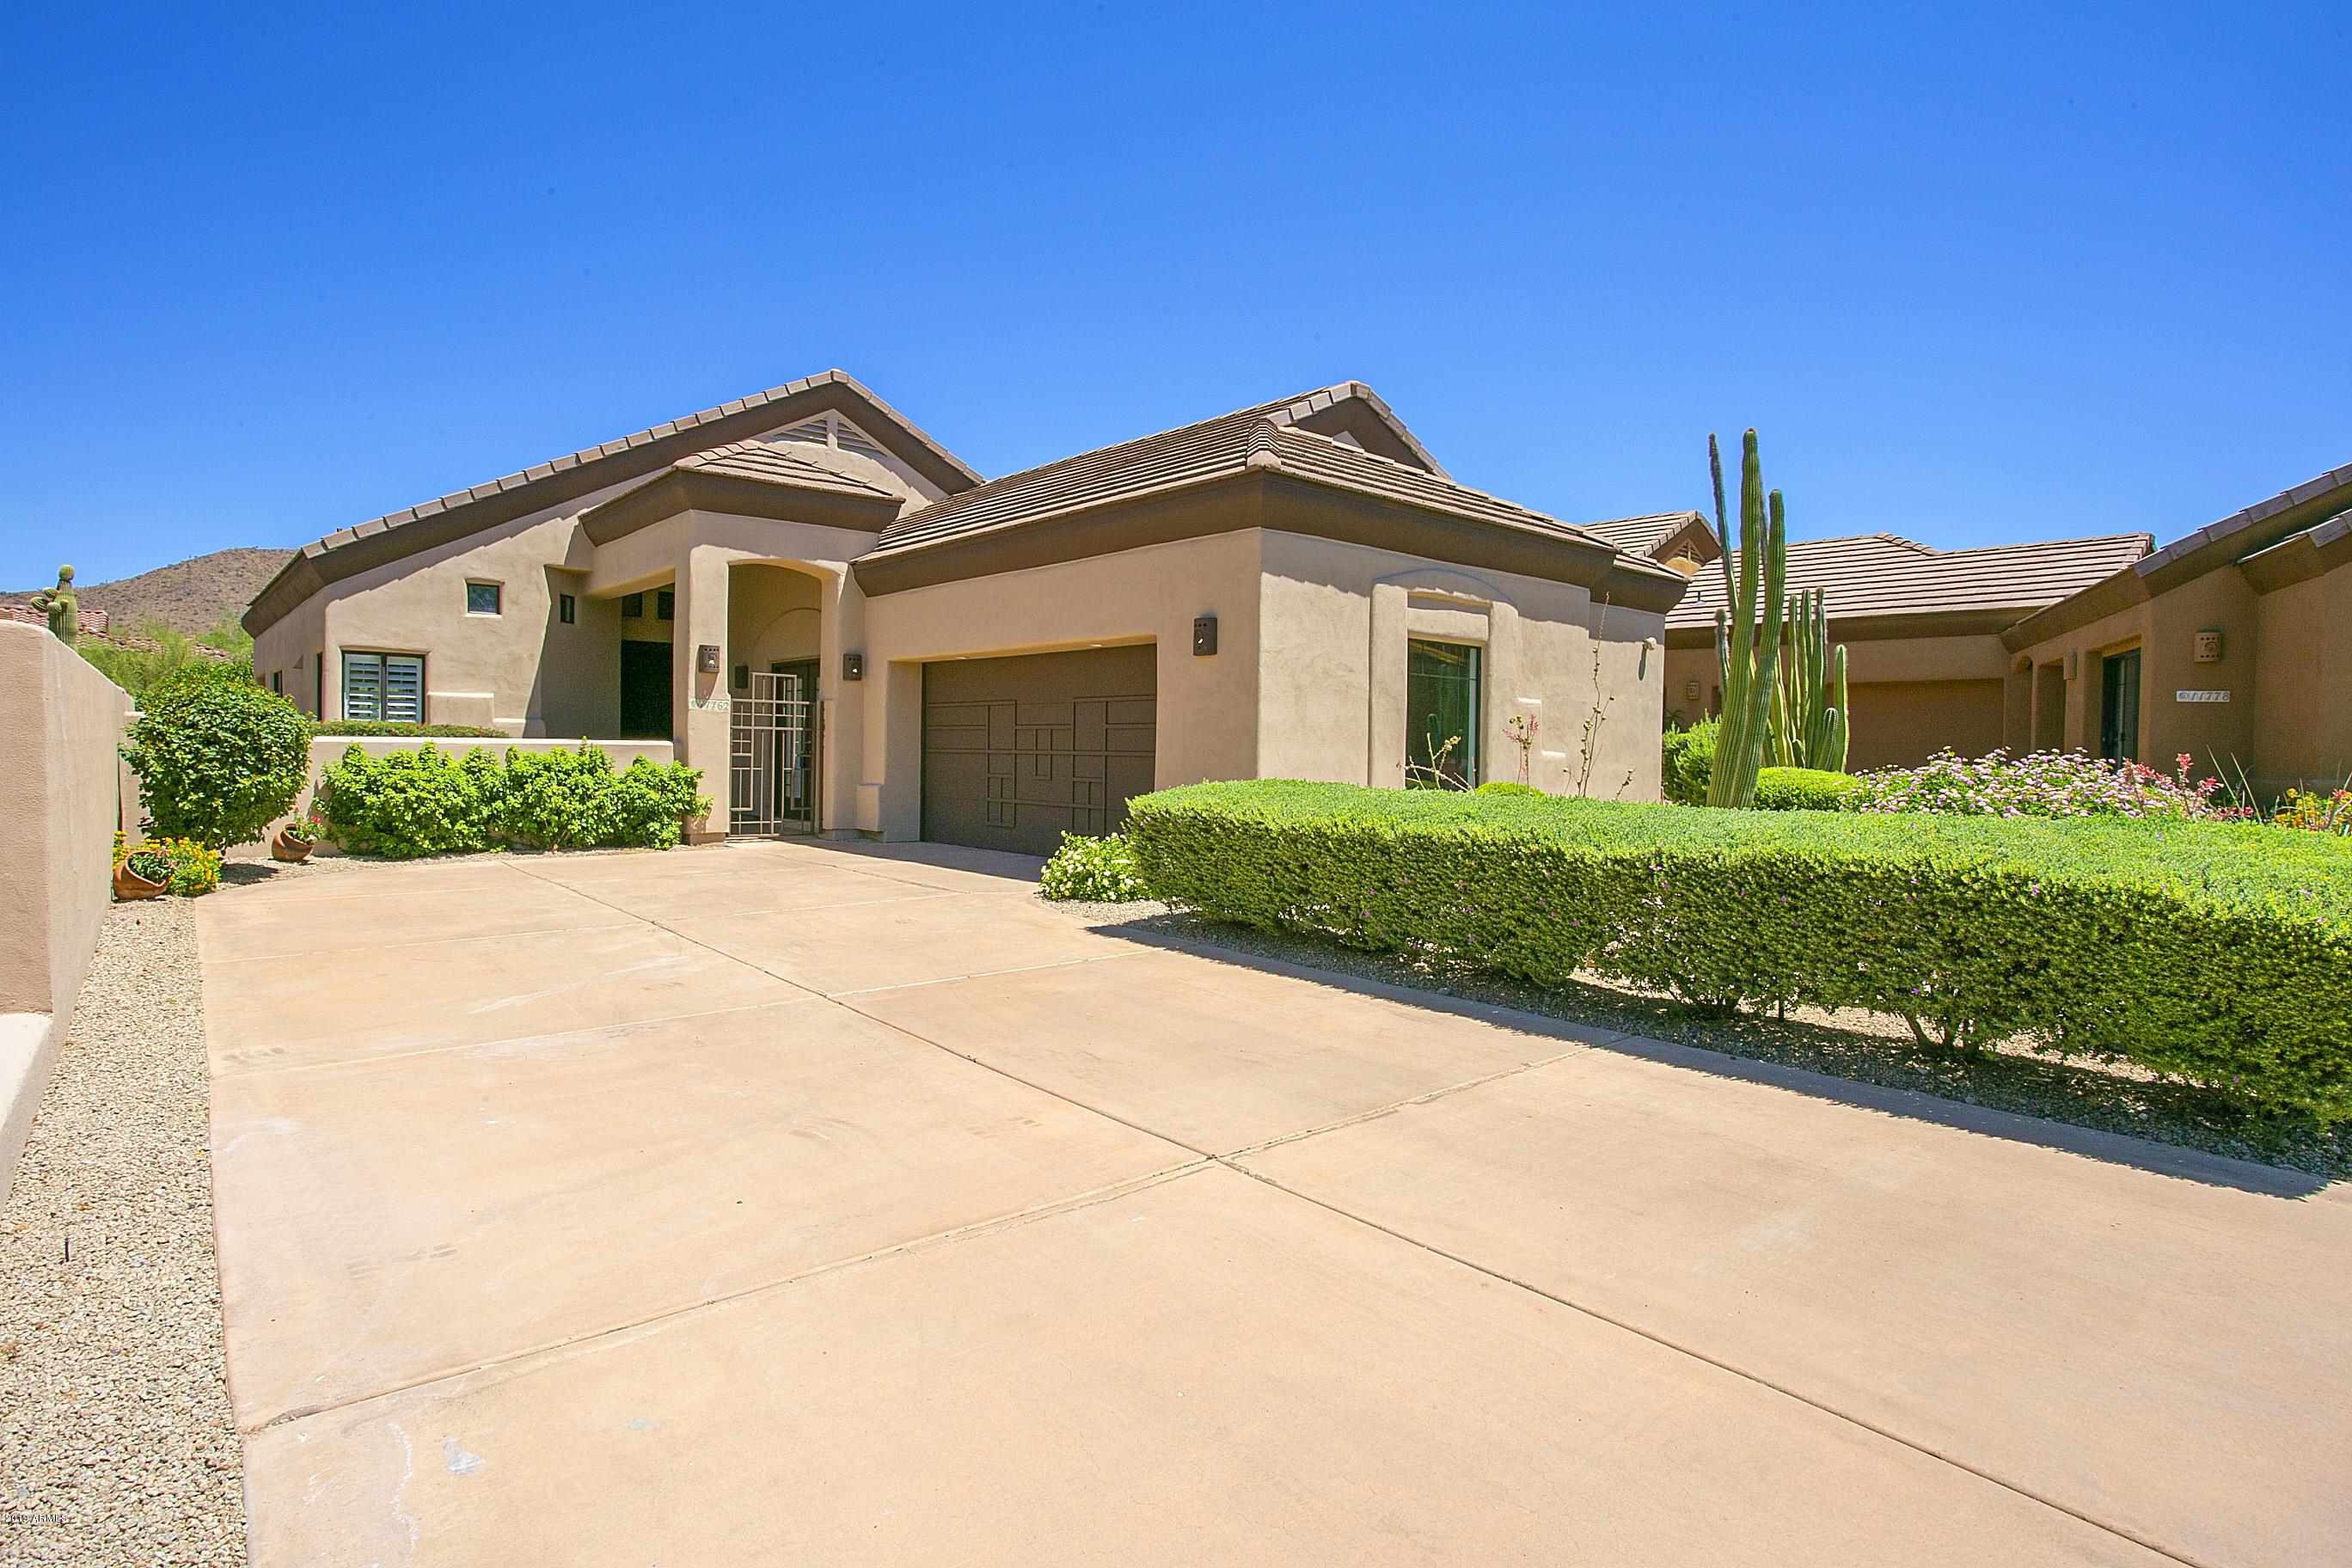 Scottsdale AZ 85259 Photo 3